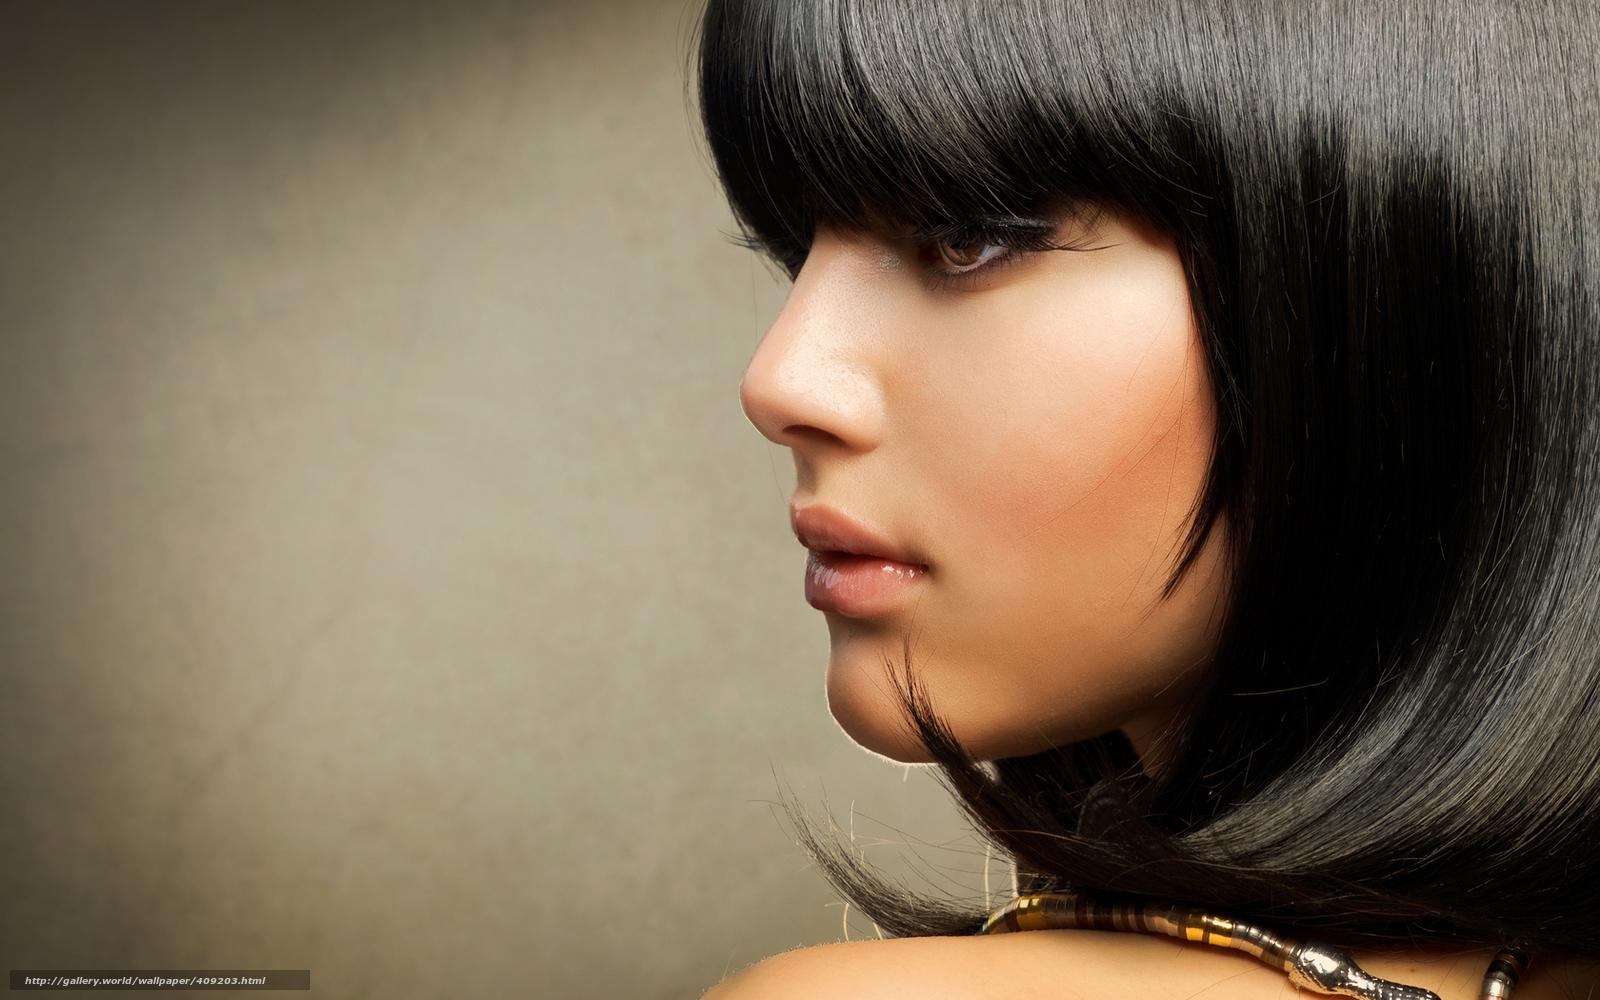 Стрижки девушек брюнеток лицо 6 фотография